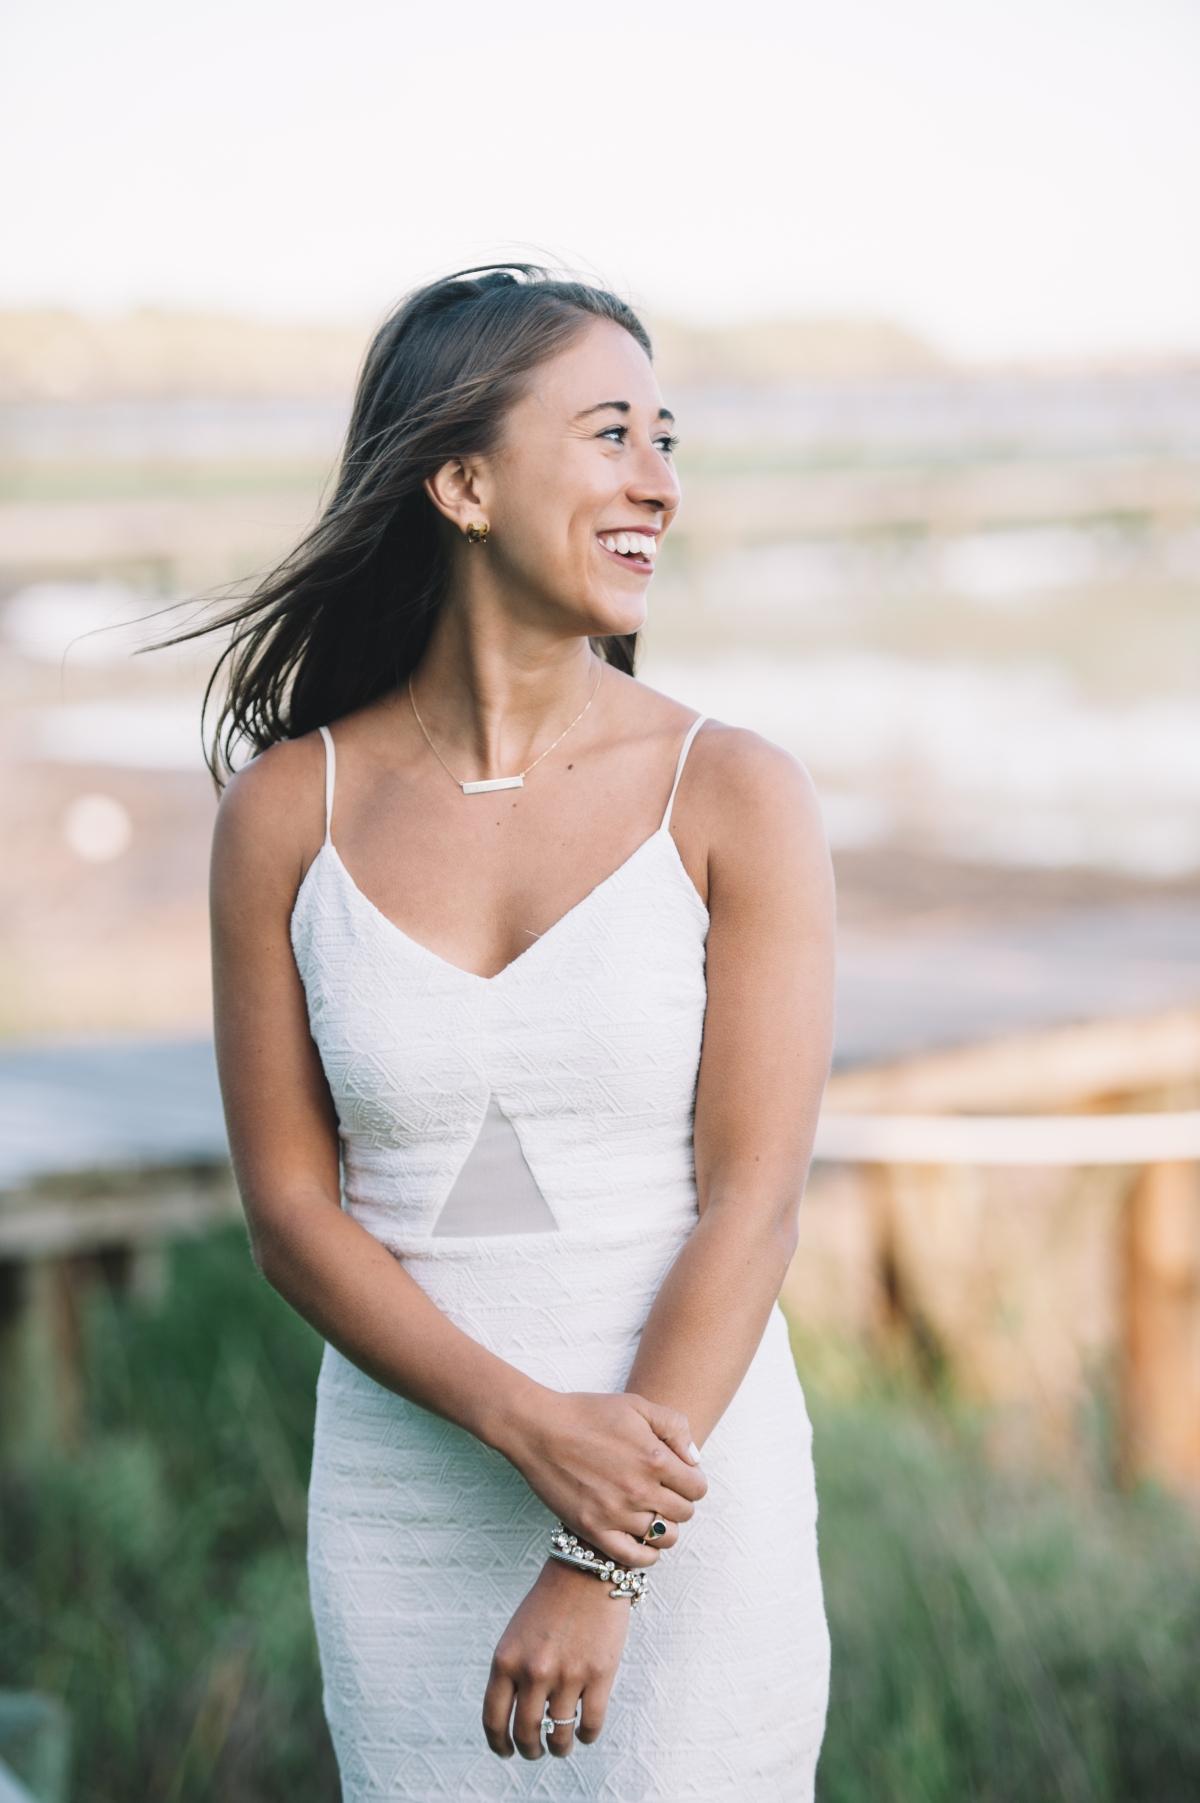 Fran: Health & Wellness Blogger, Social MediaManager